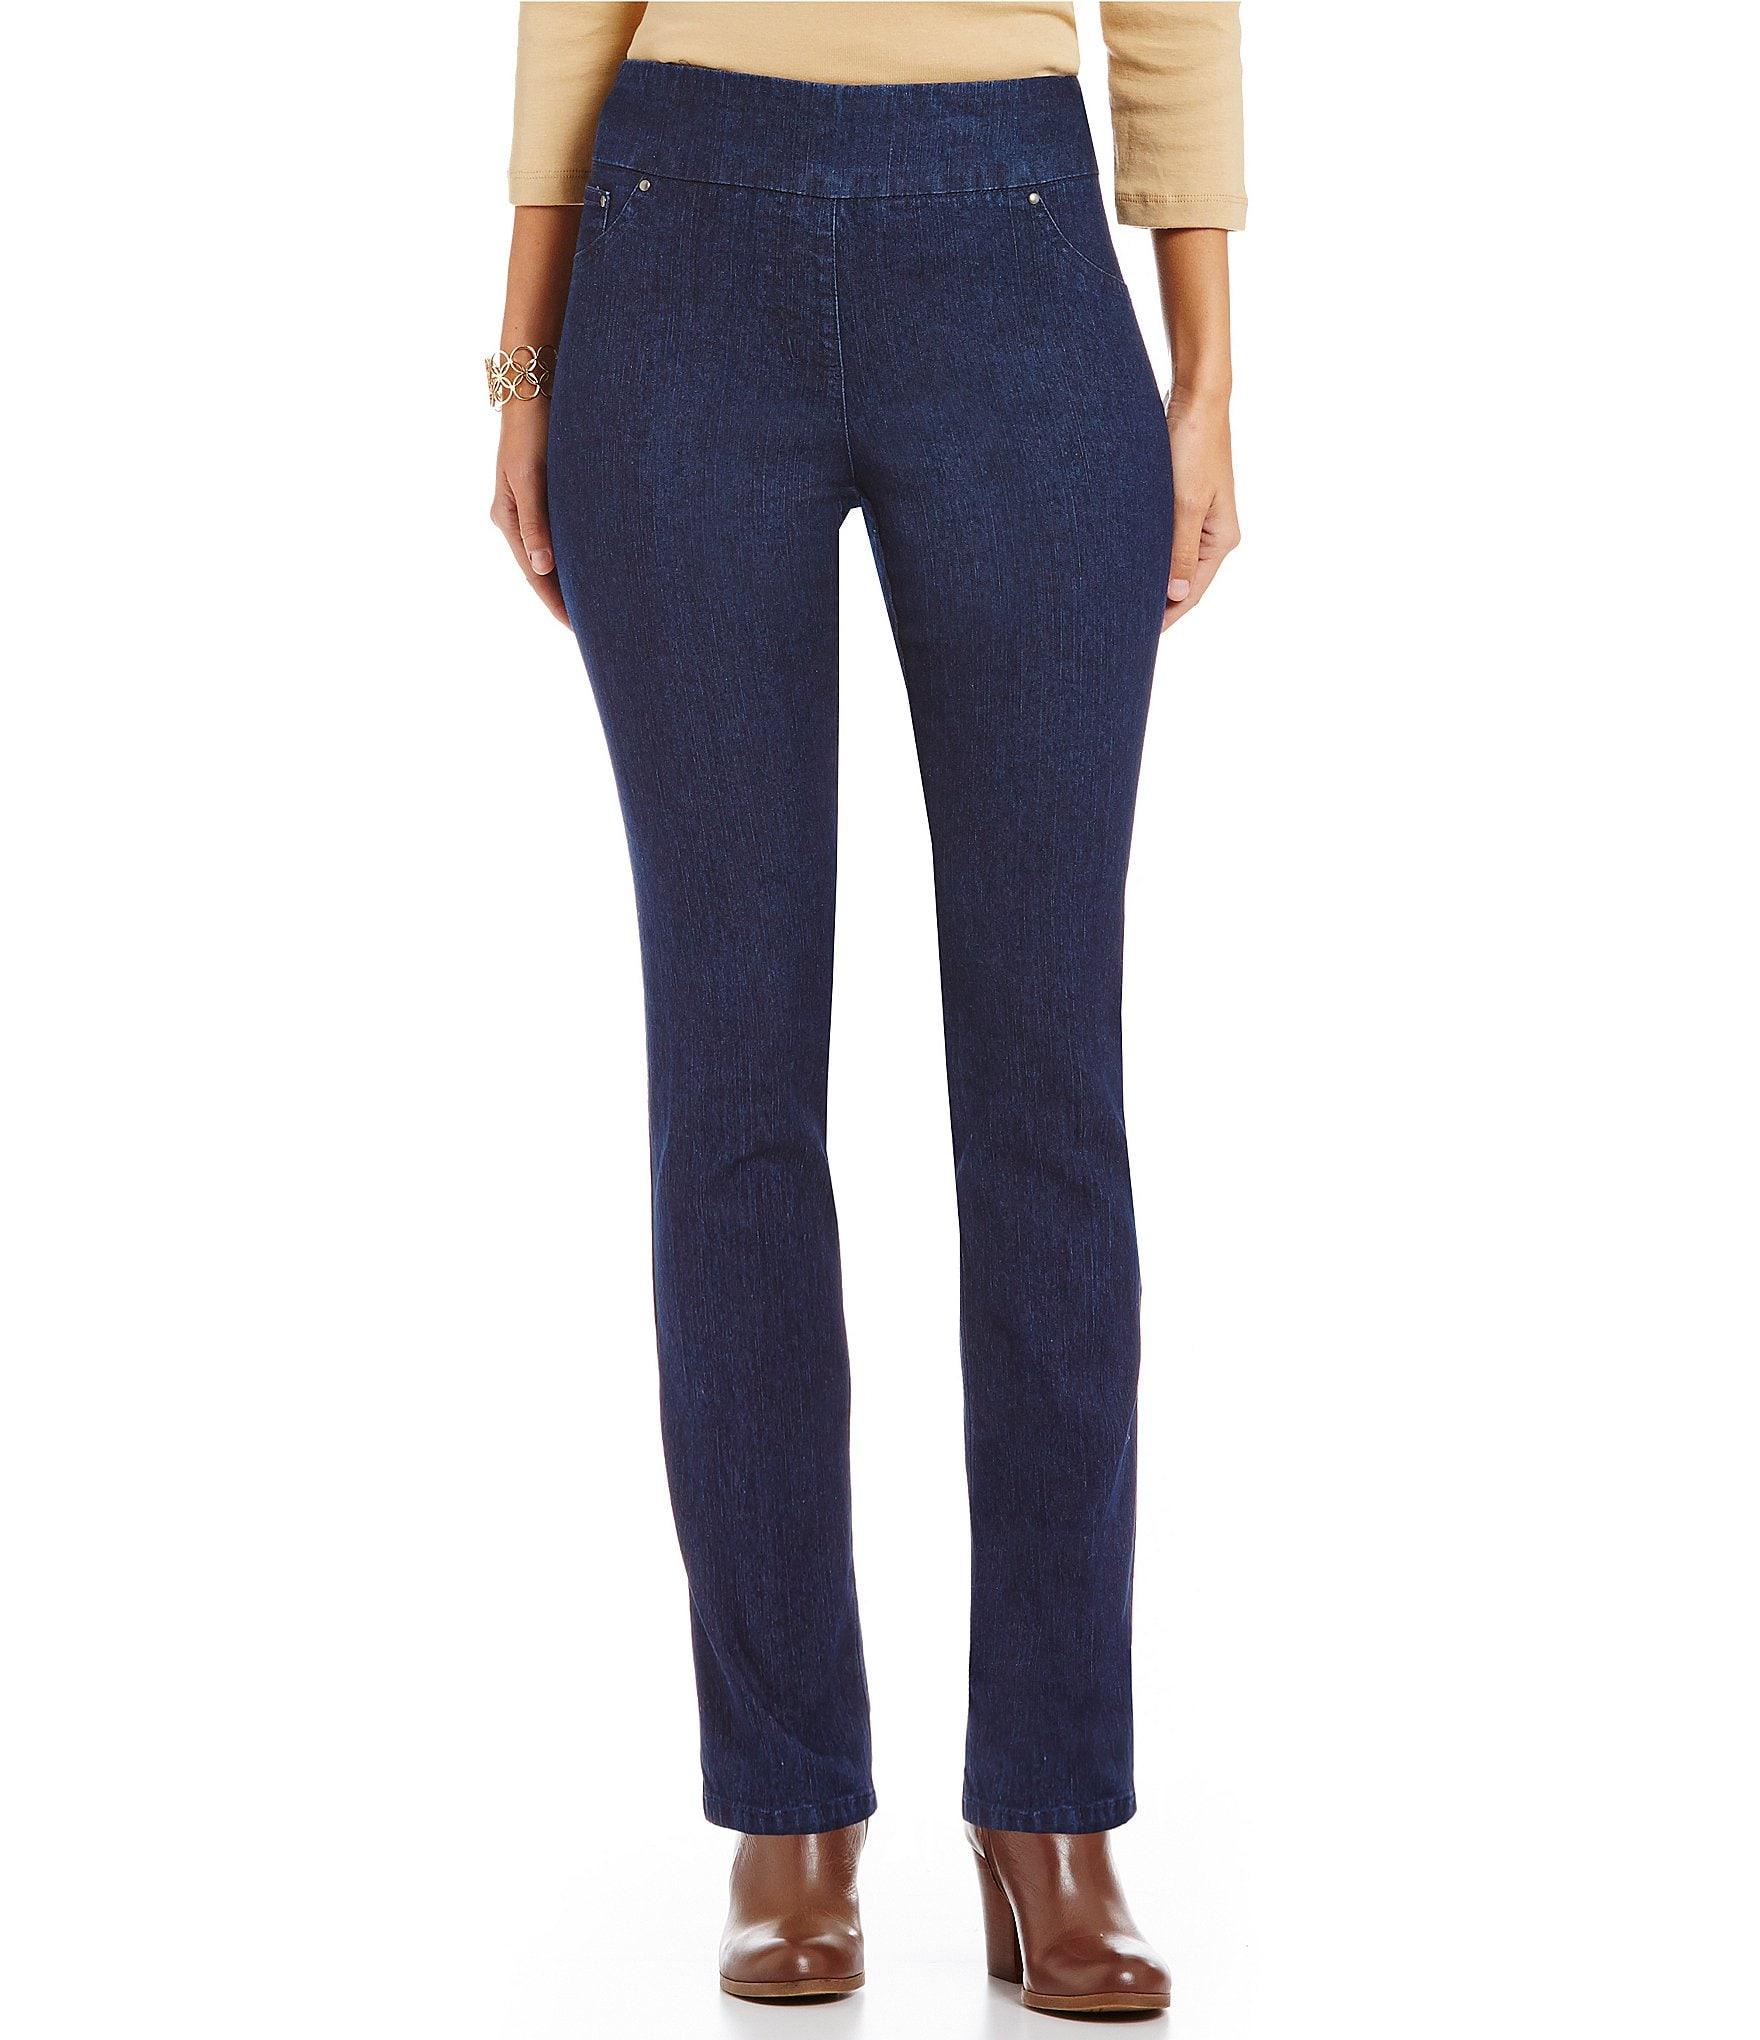 Ruby Rd. Pull-On Denim Jeans | Dillards - photo#21